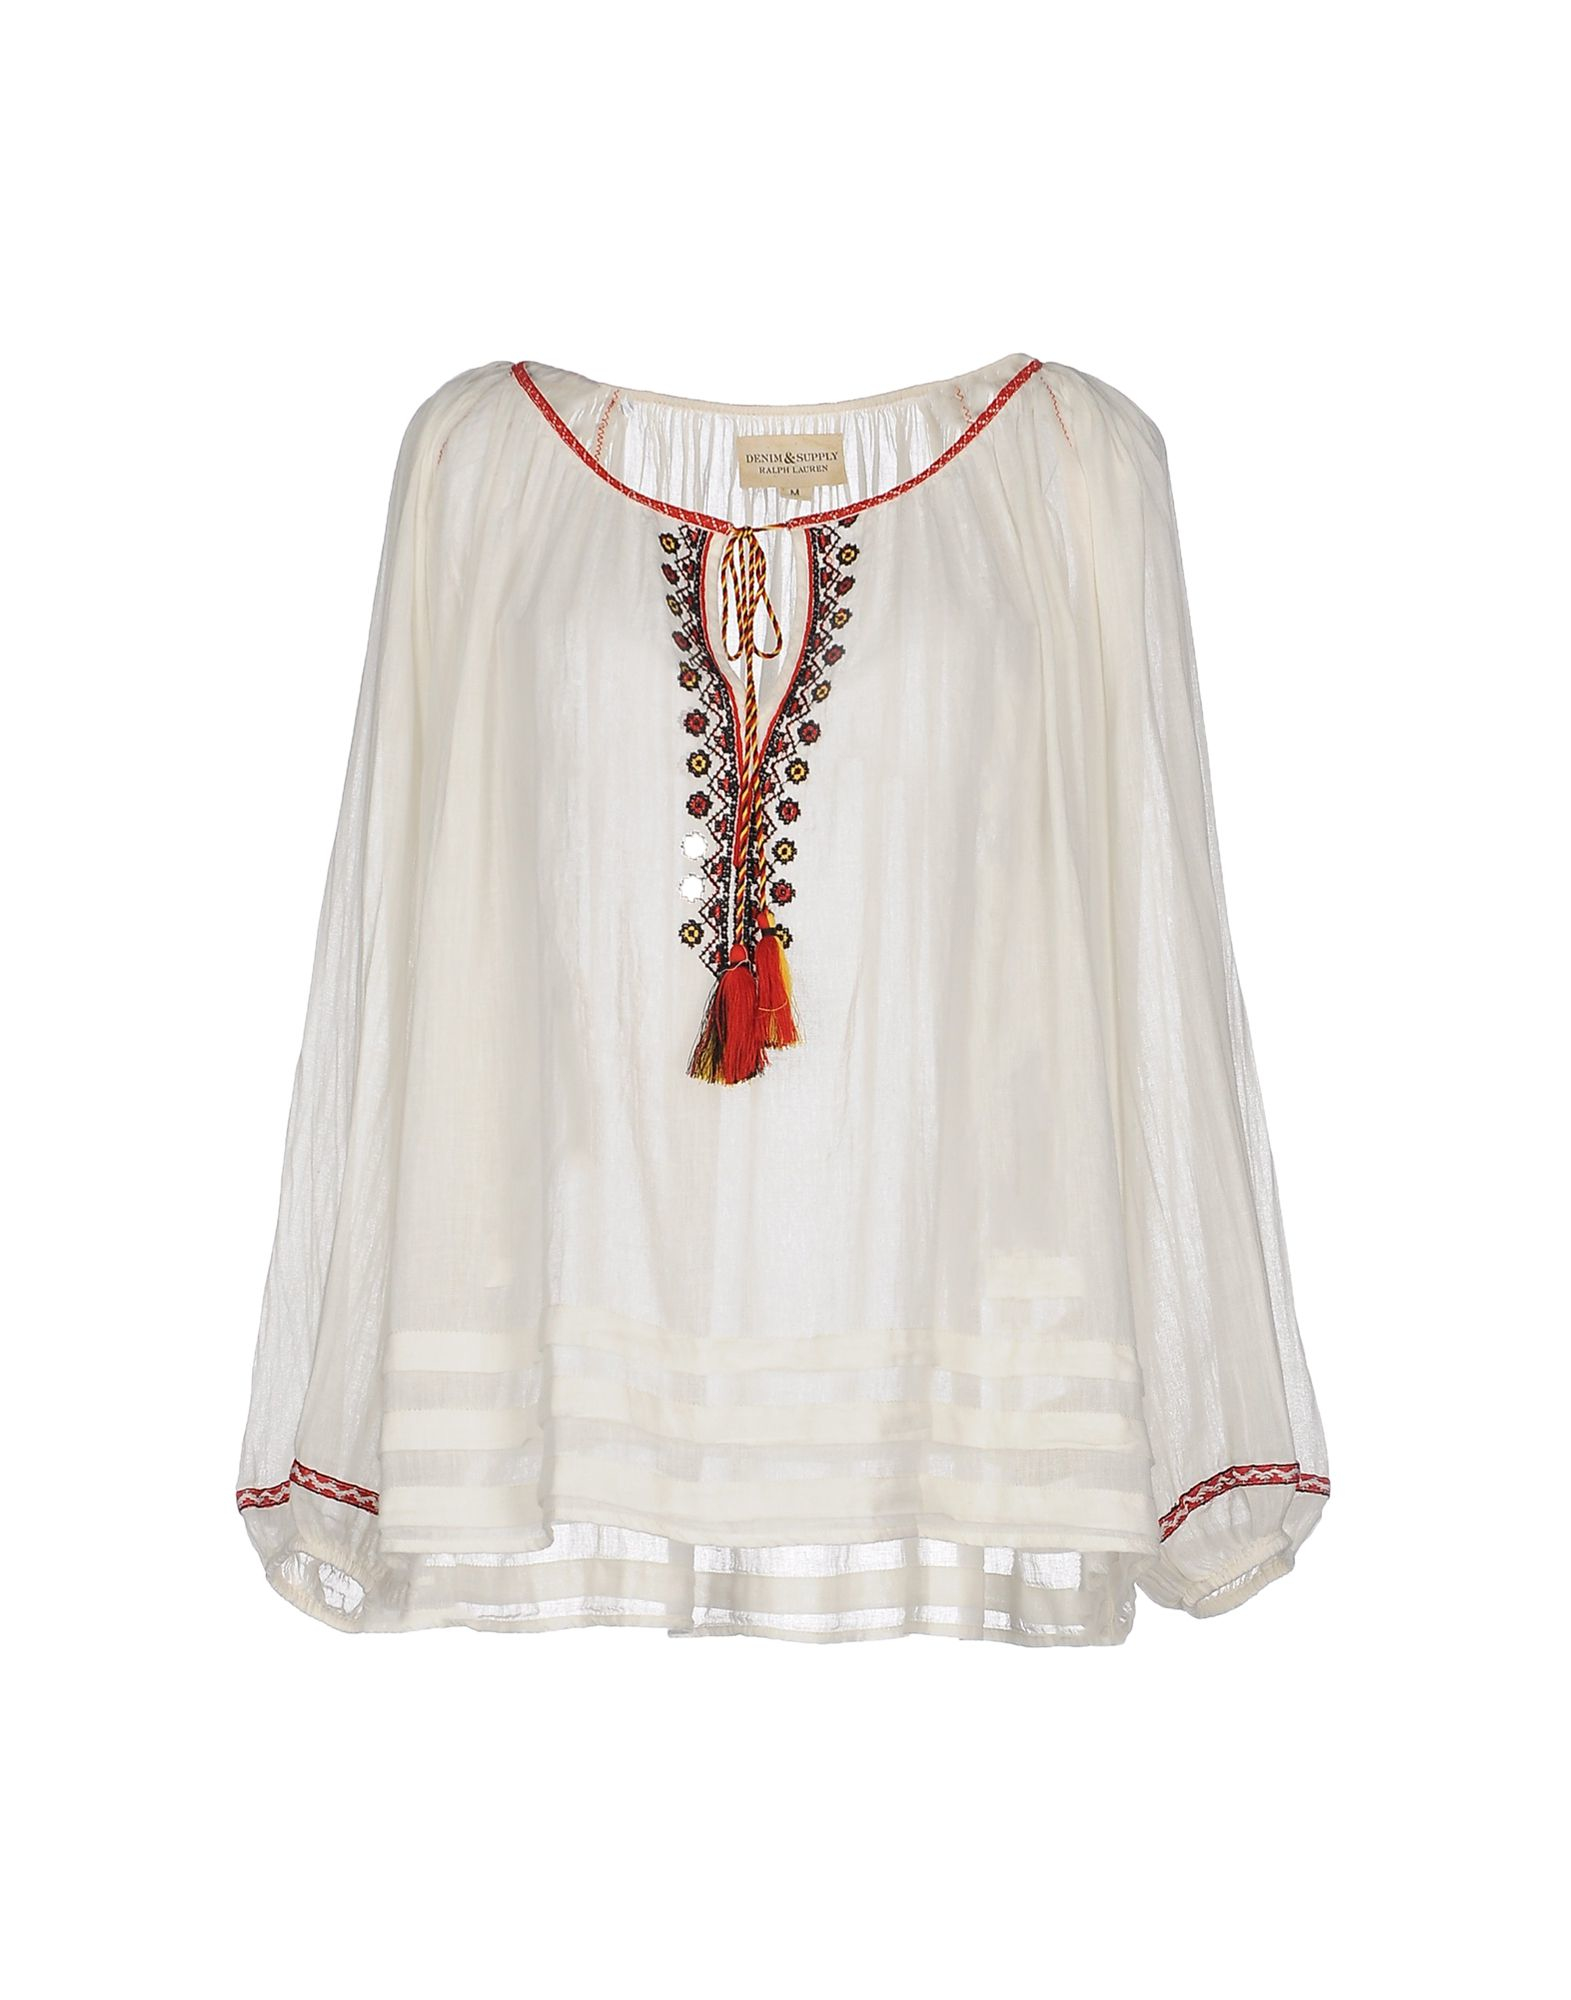 ralph lauren womens white blouse hot black blouse. Black Bedroom Furniture Sets. Home Design Ideas